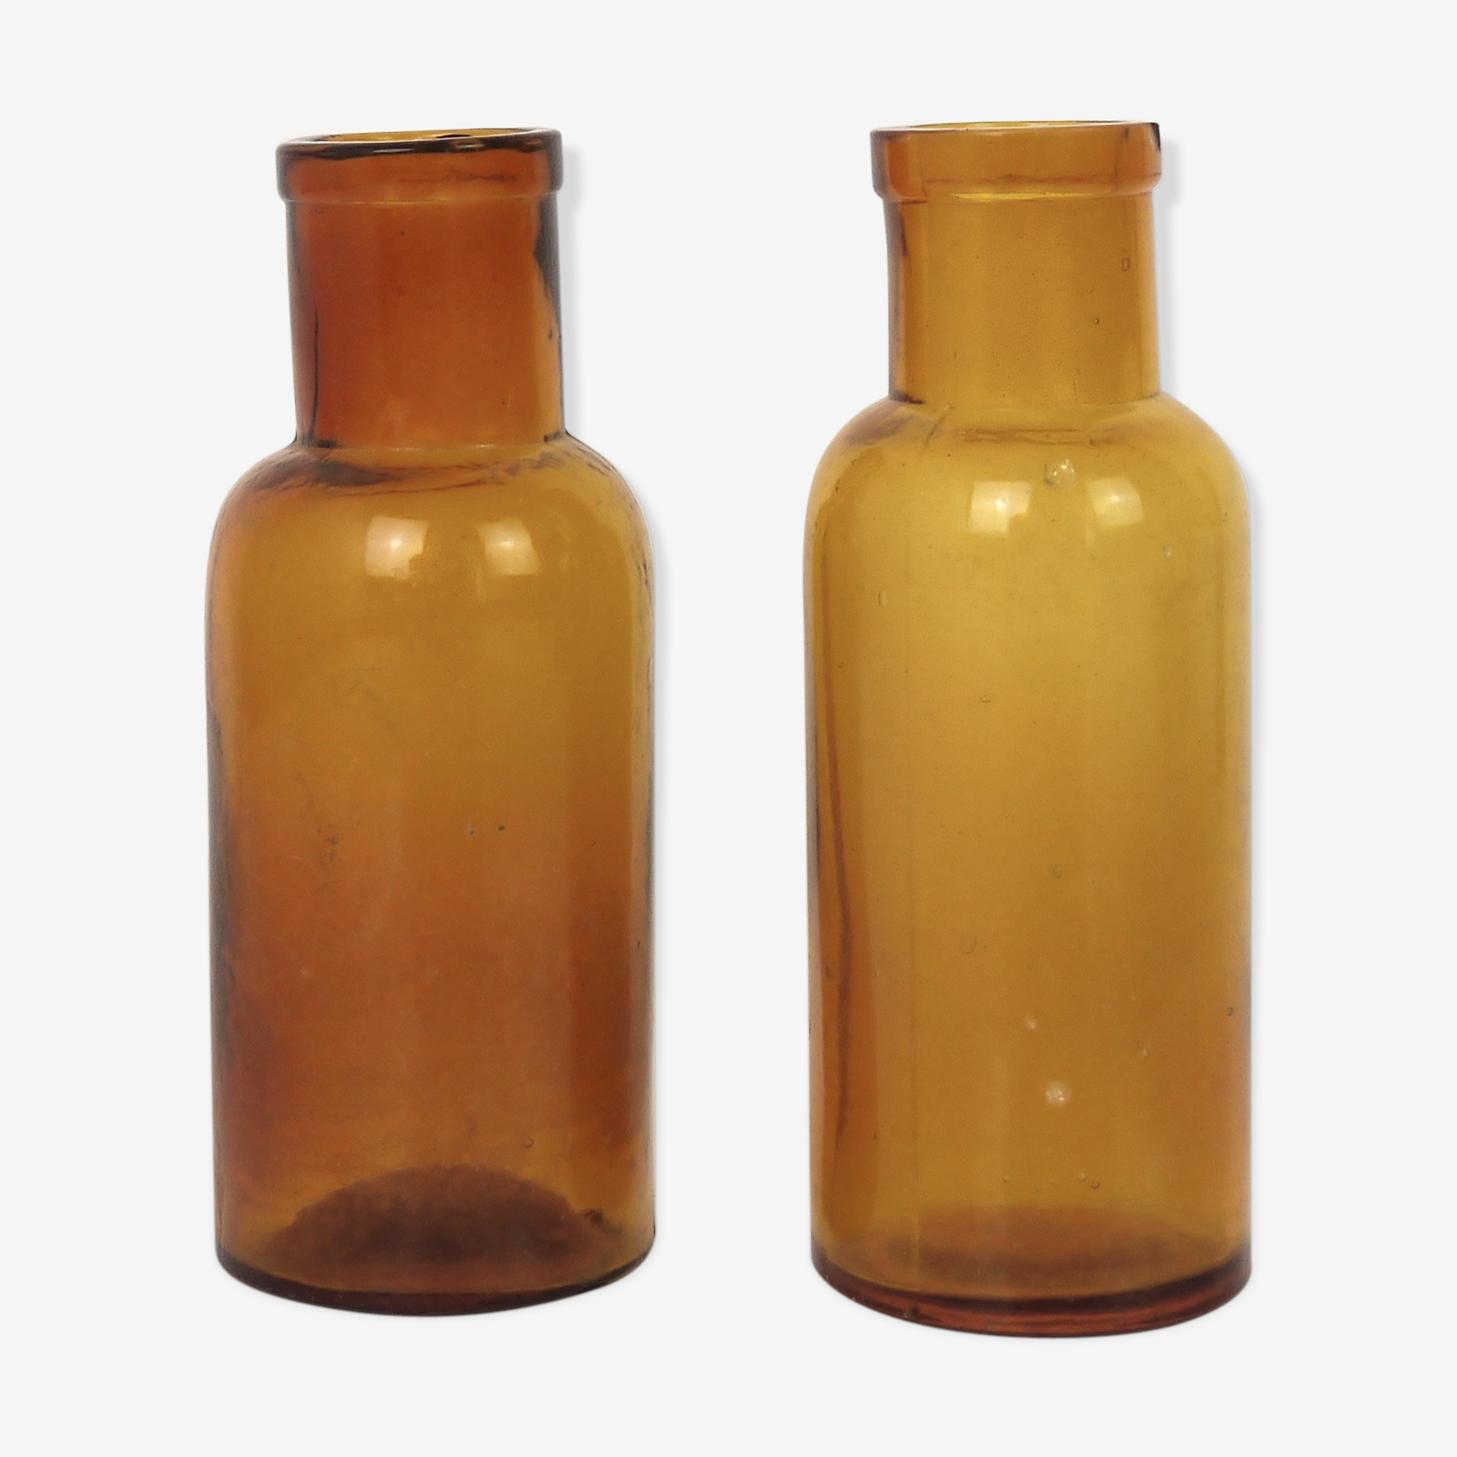 Two brown glass pharmacy bottles